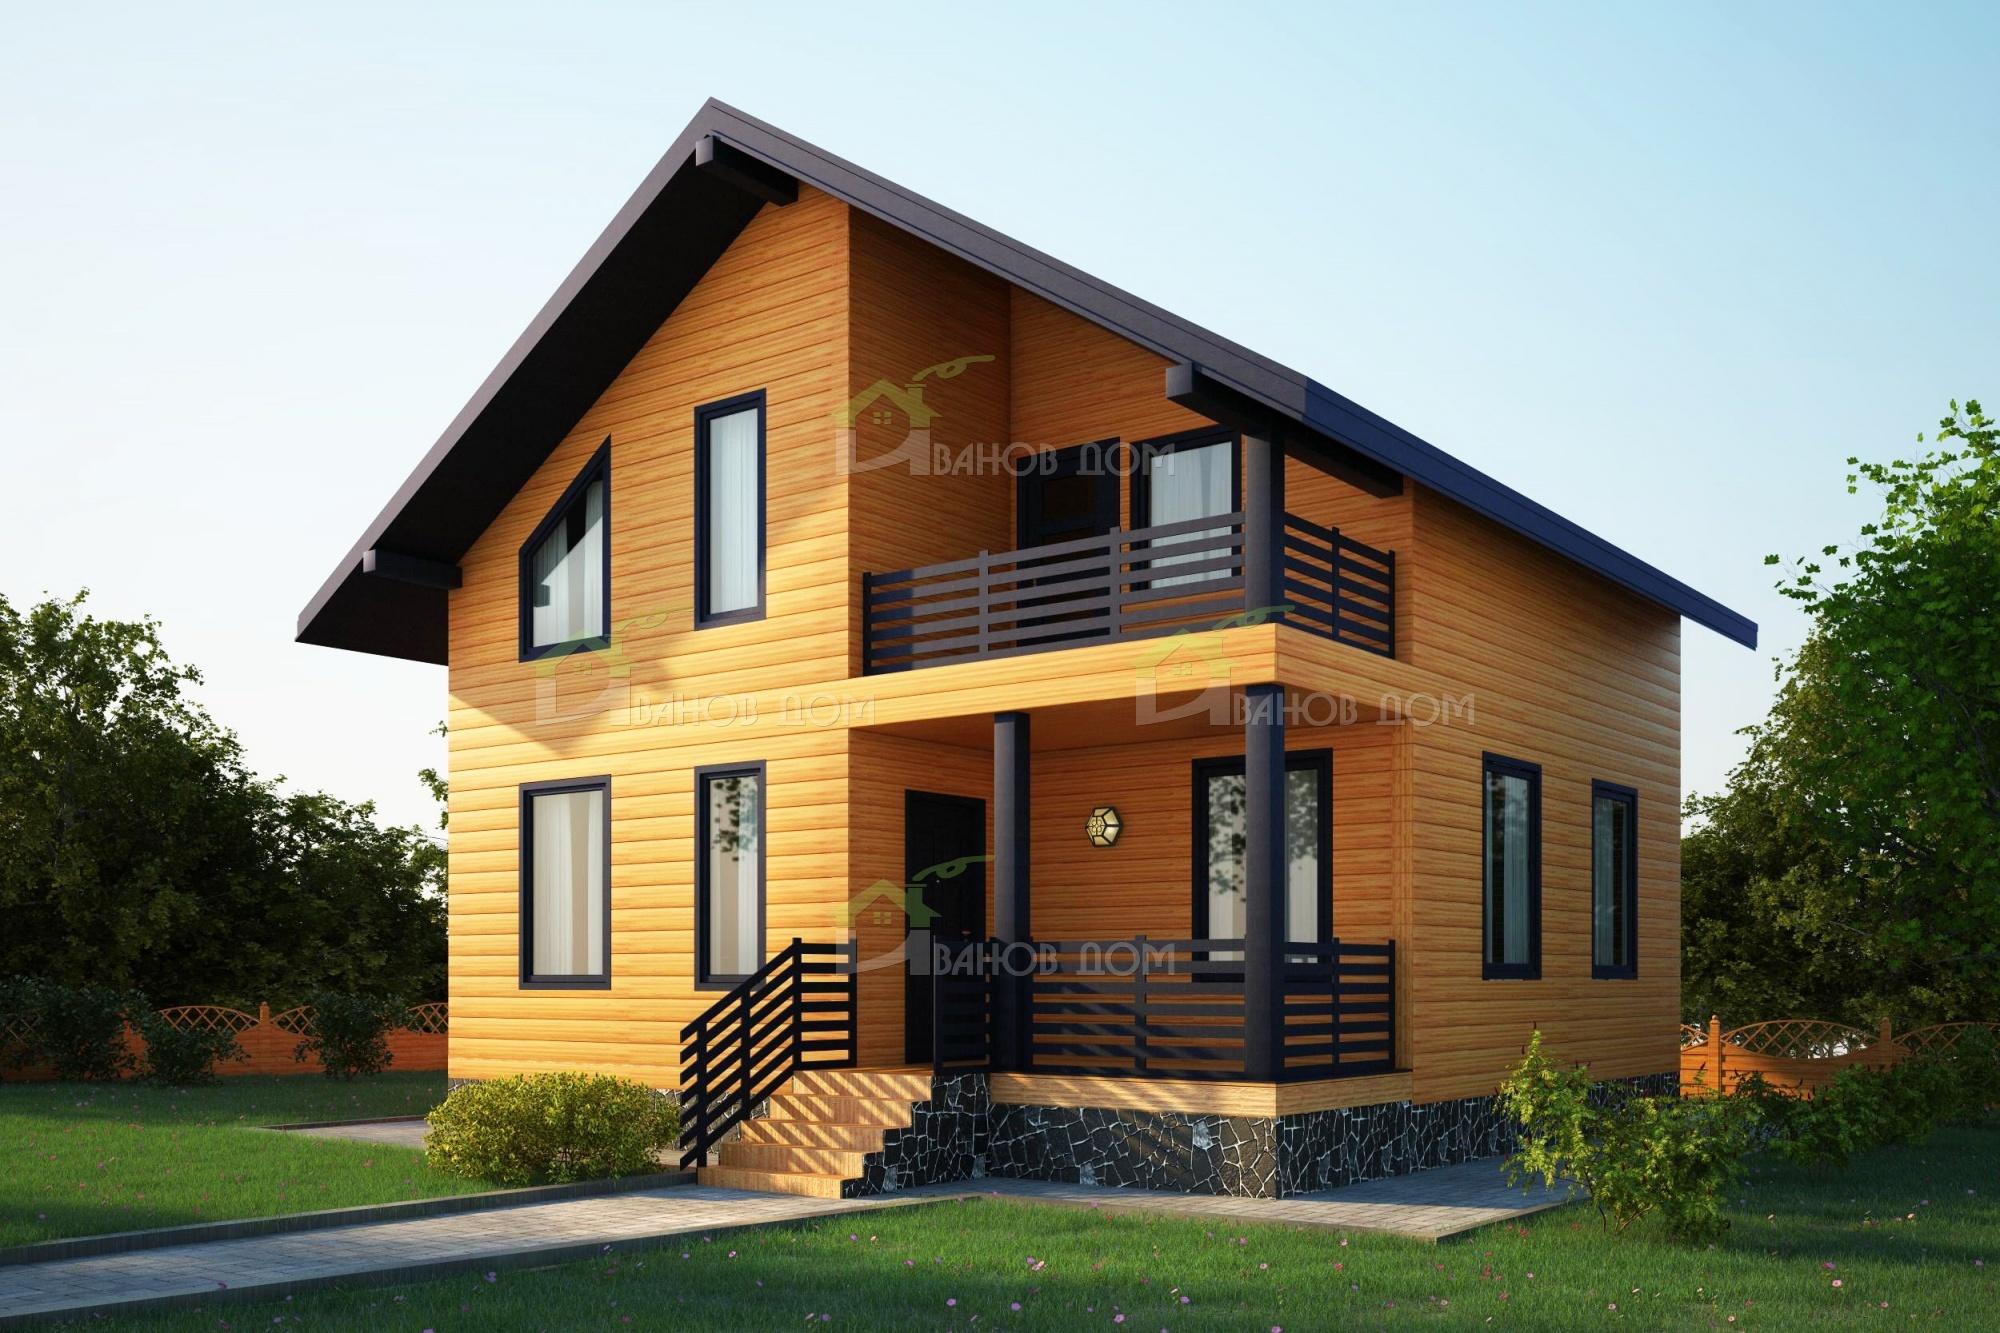 Gradnja hiš iz lesa st petersburg